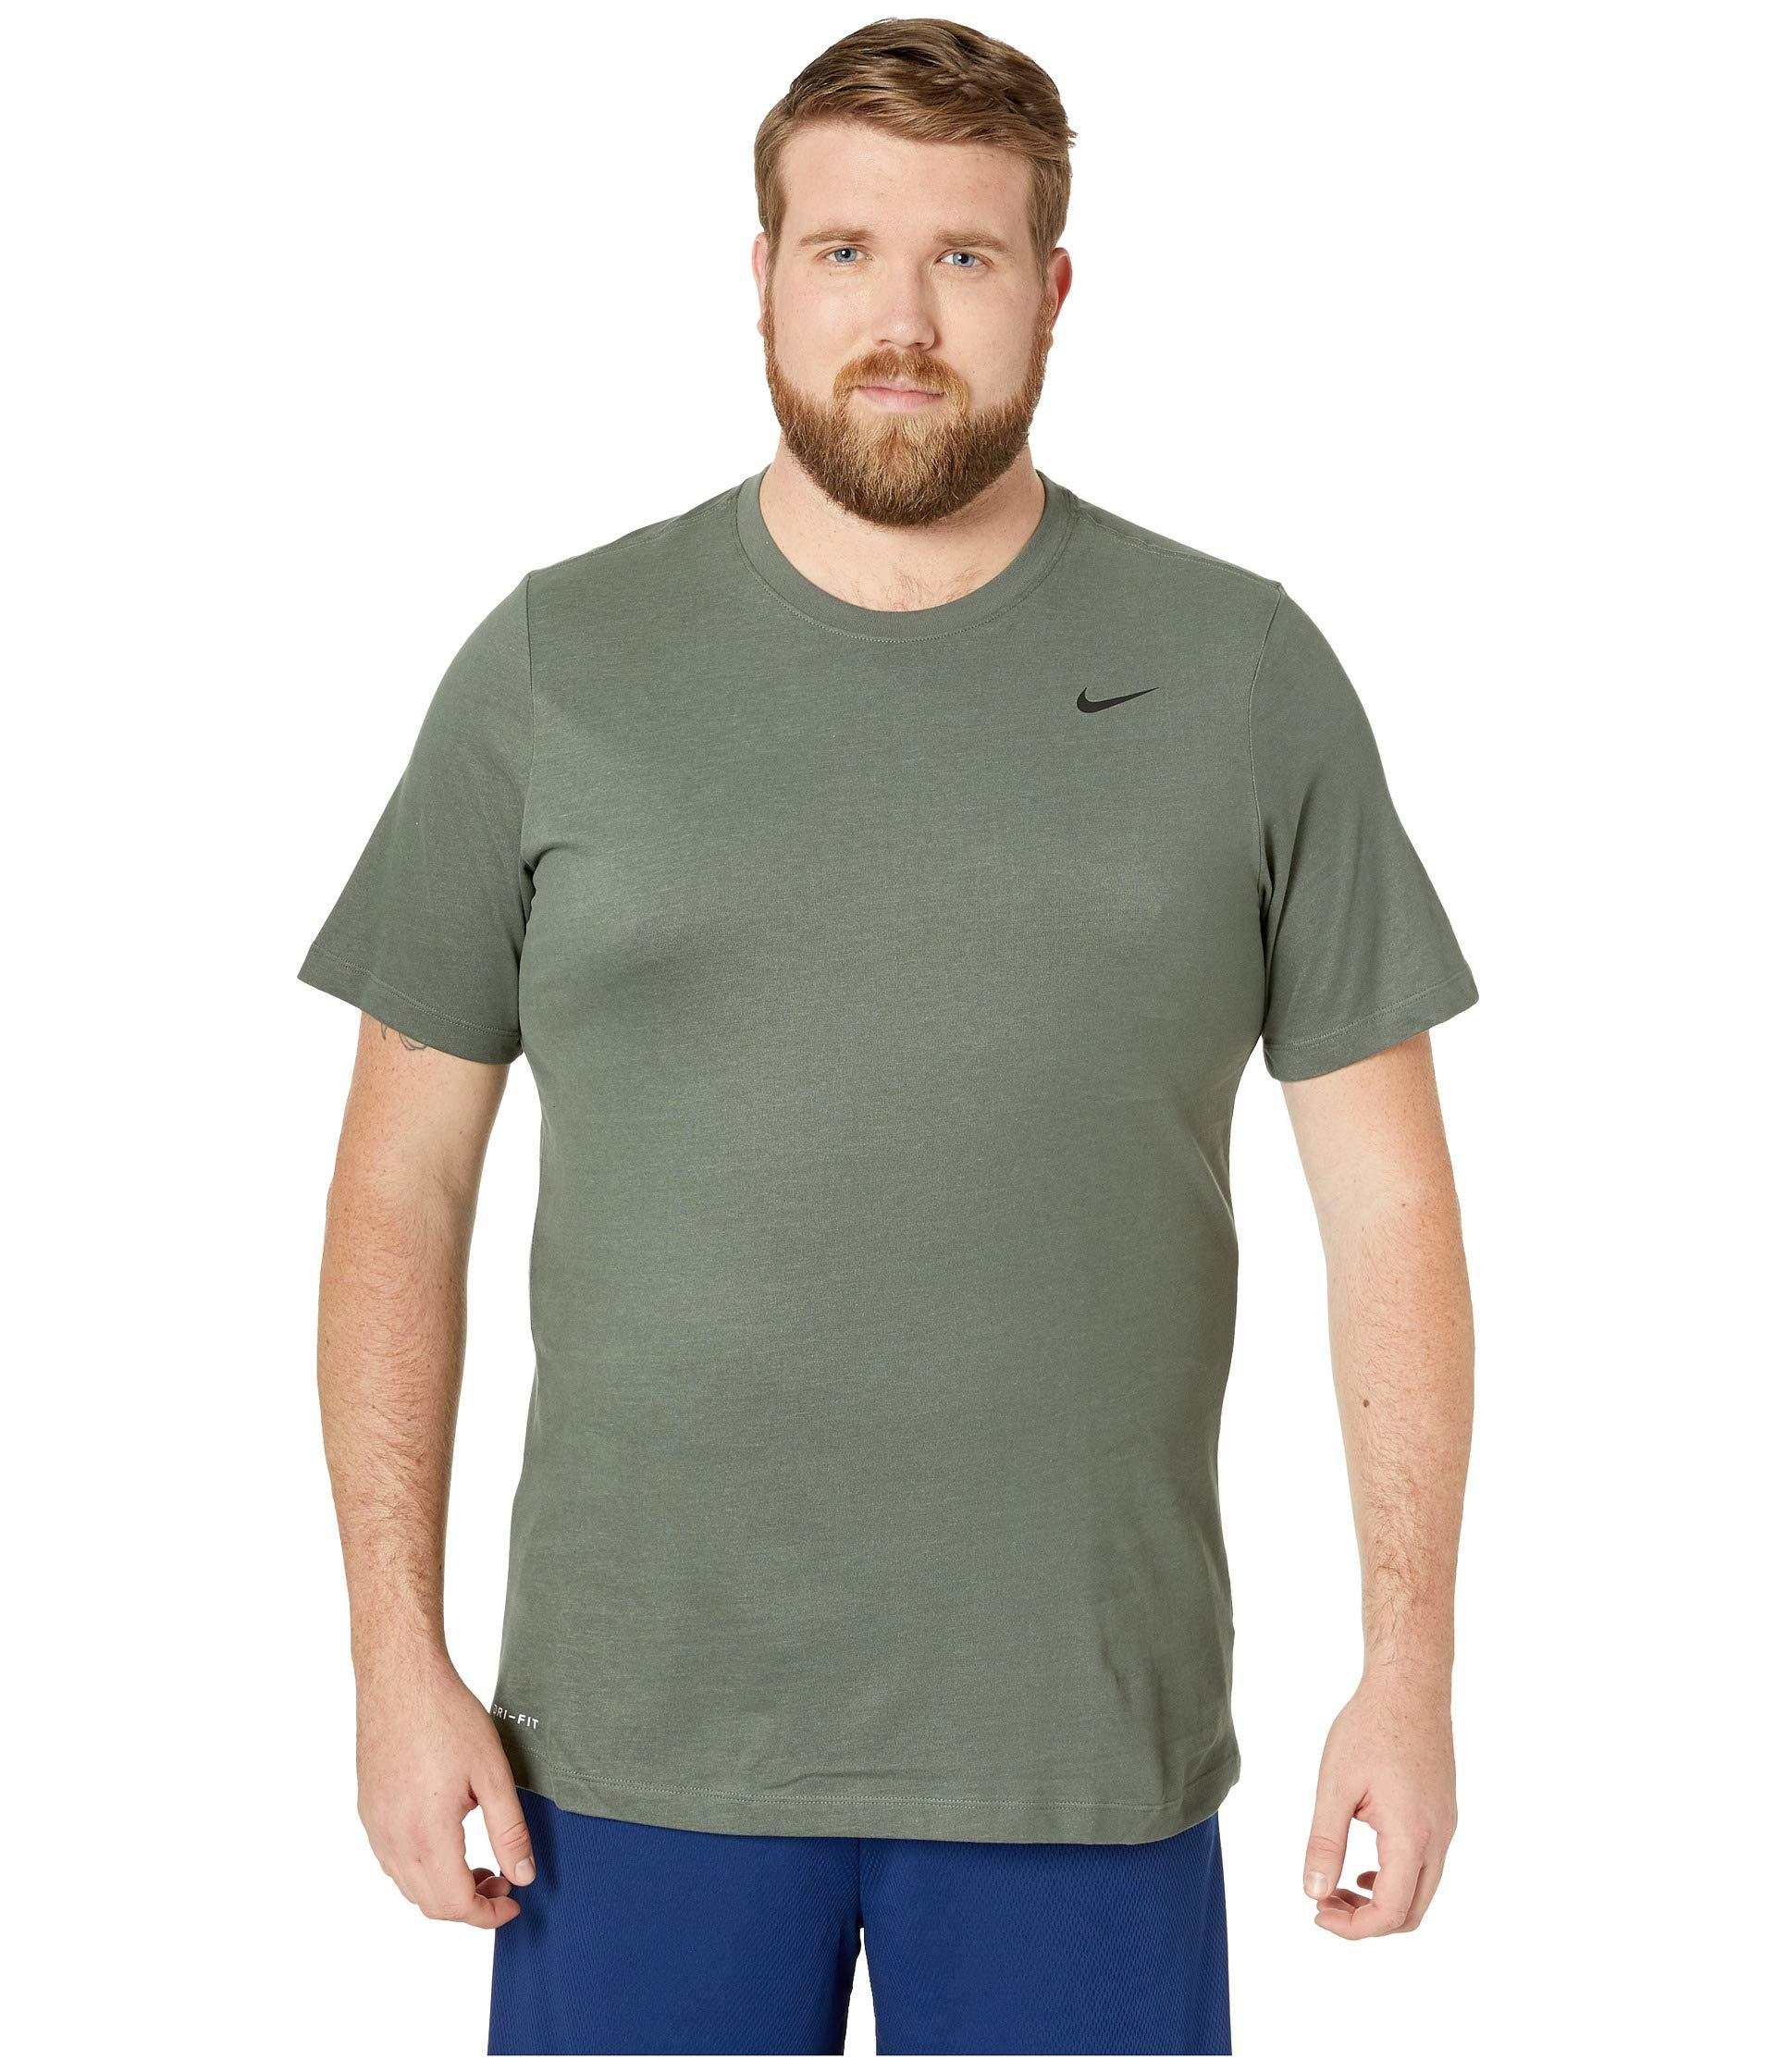 87168ed4 Lyst - Nike Big Tall Dry Tee Dri-fit Cotton Crew Solid (black/white ...